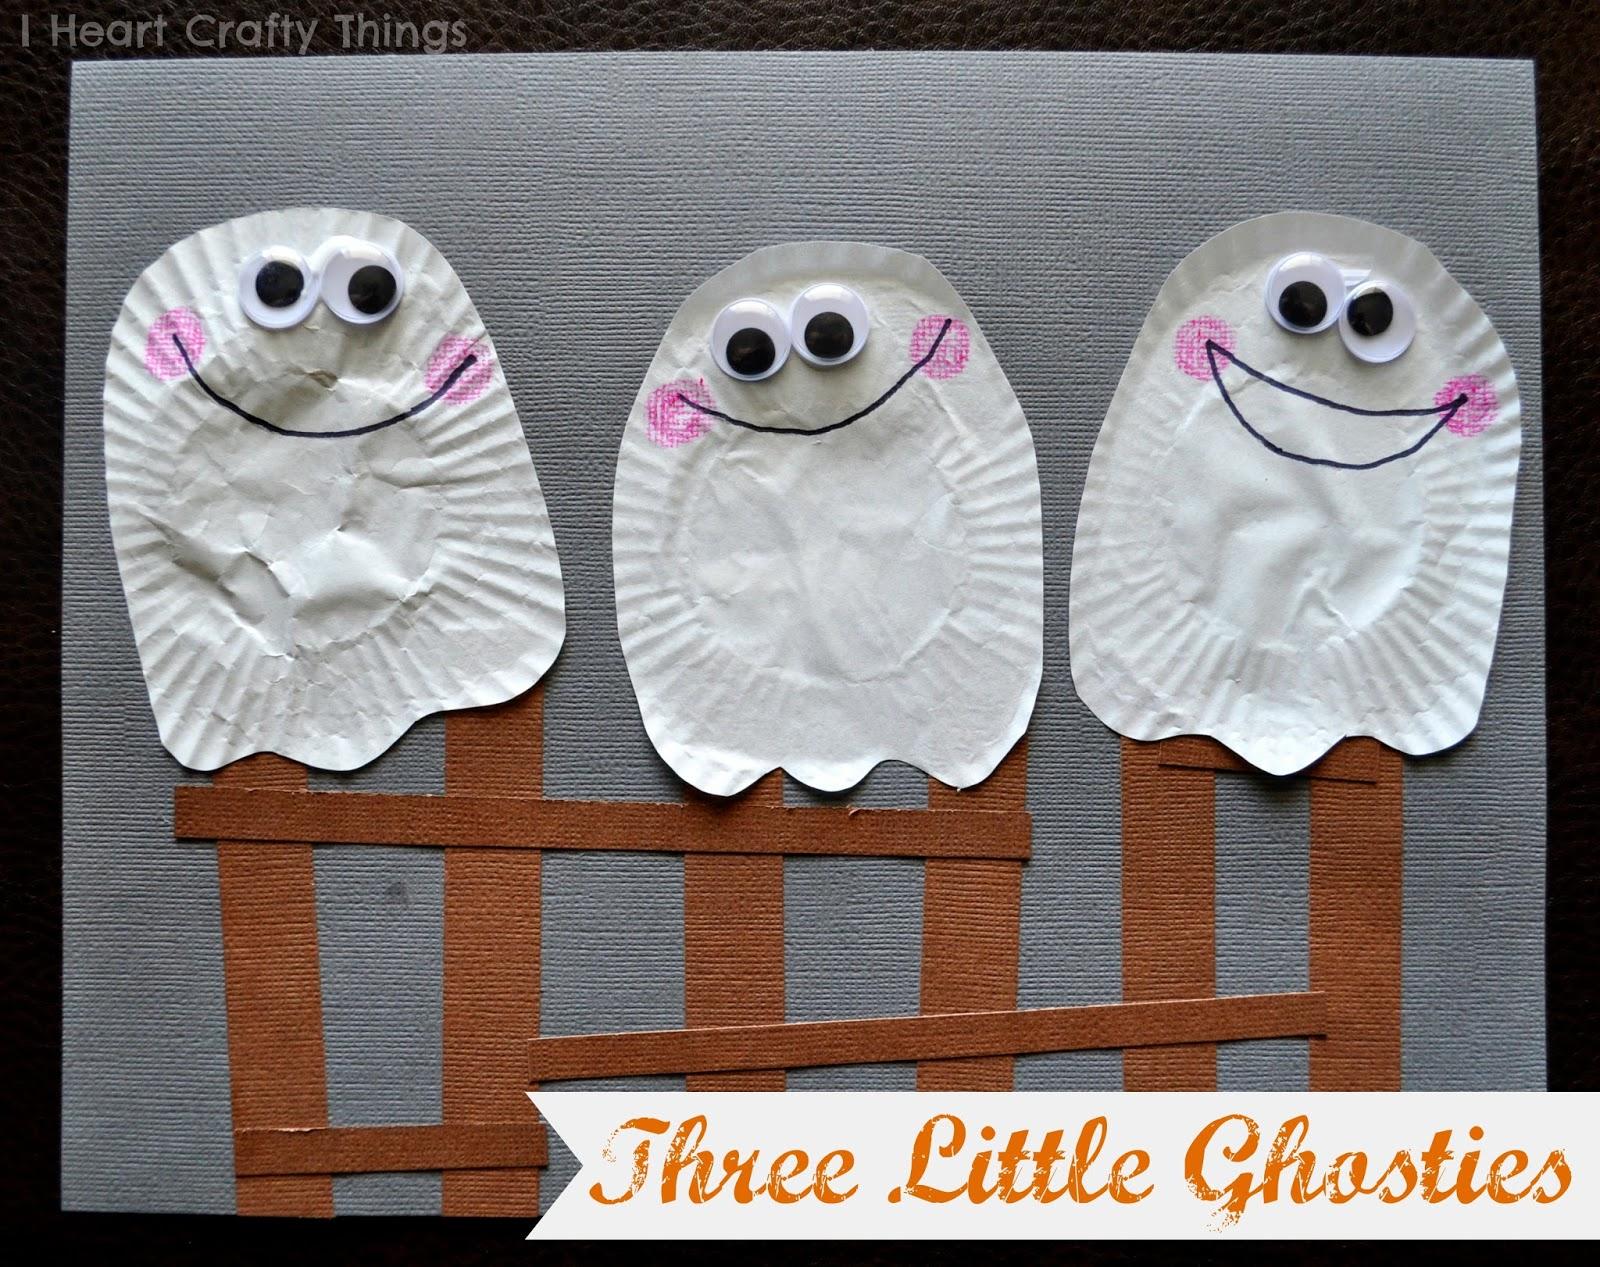 30 Days Of Halloween Three Little Ghosties Kids Craft I Heart